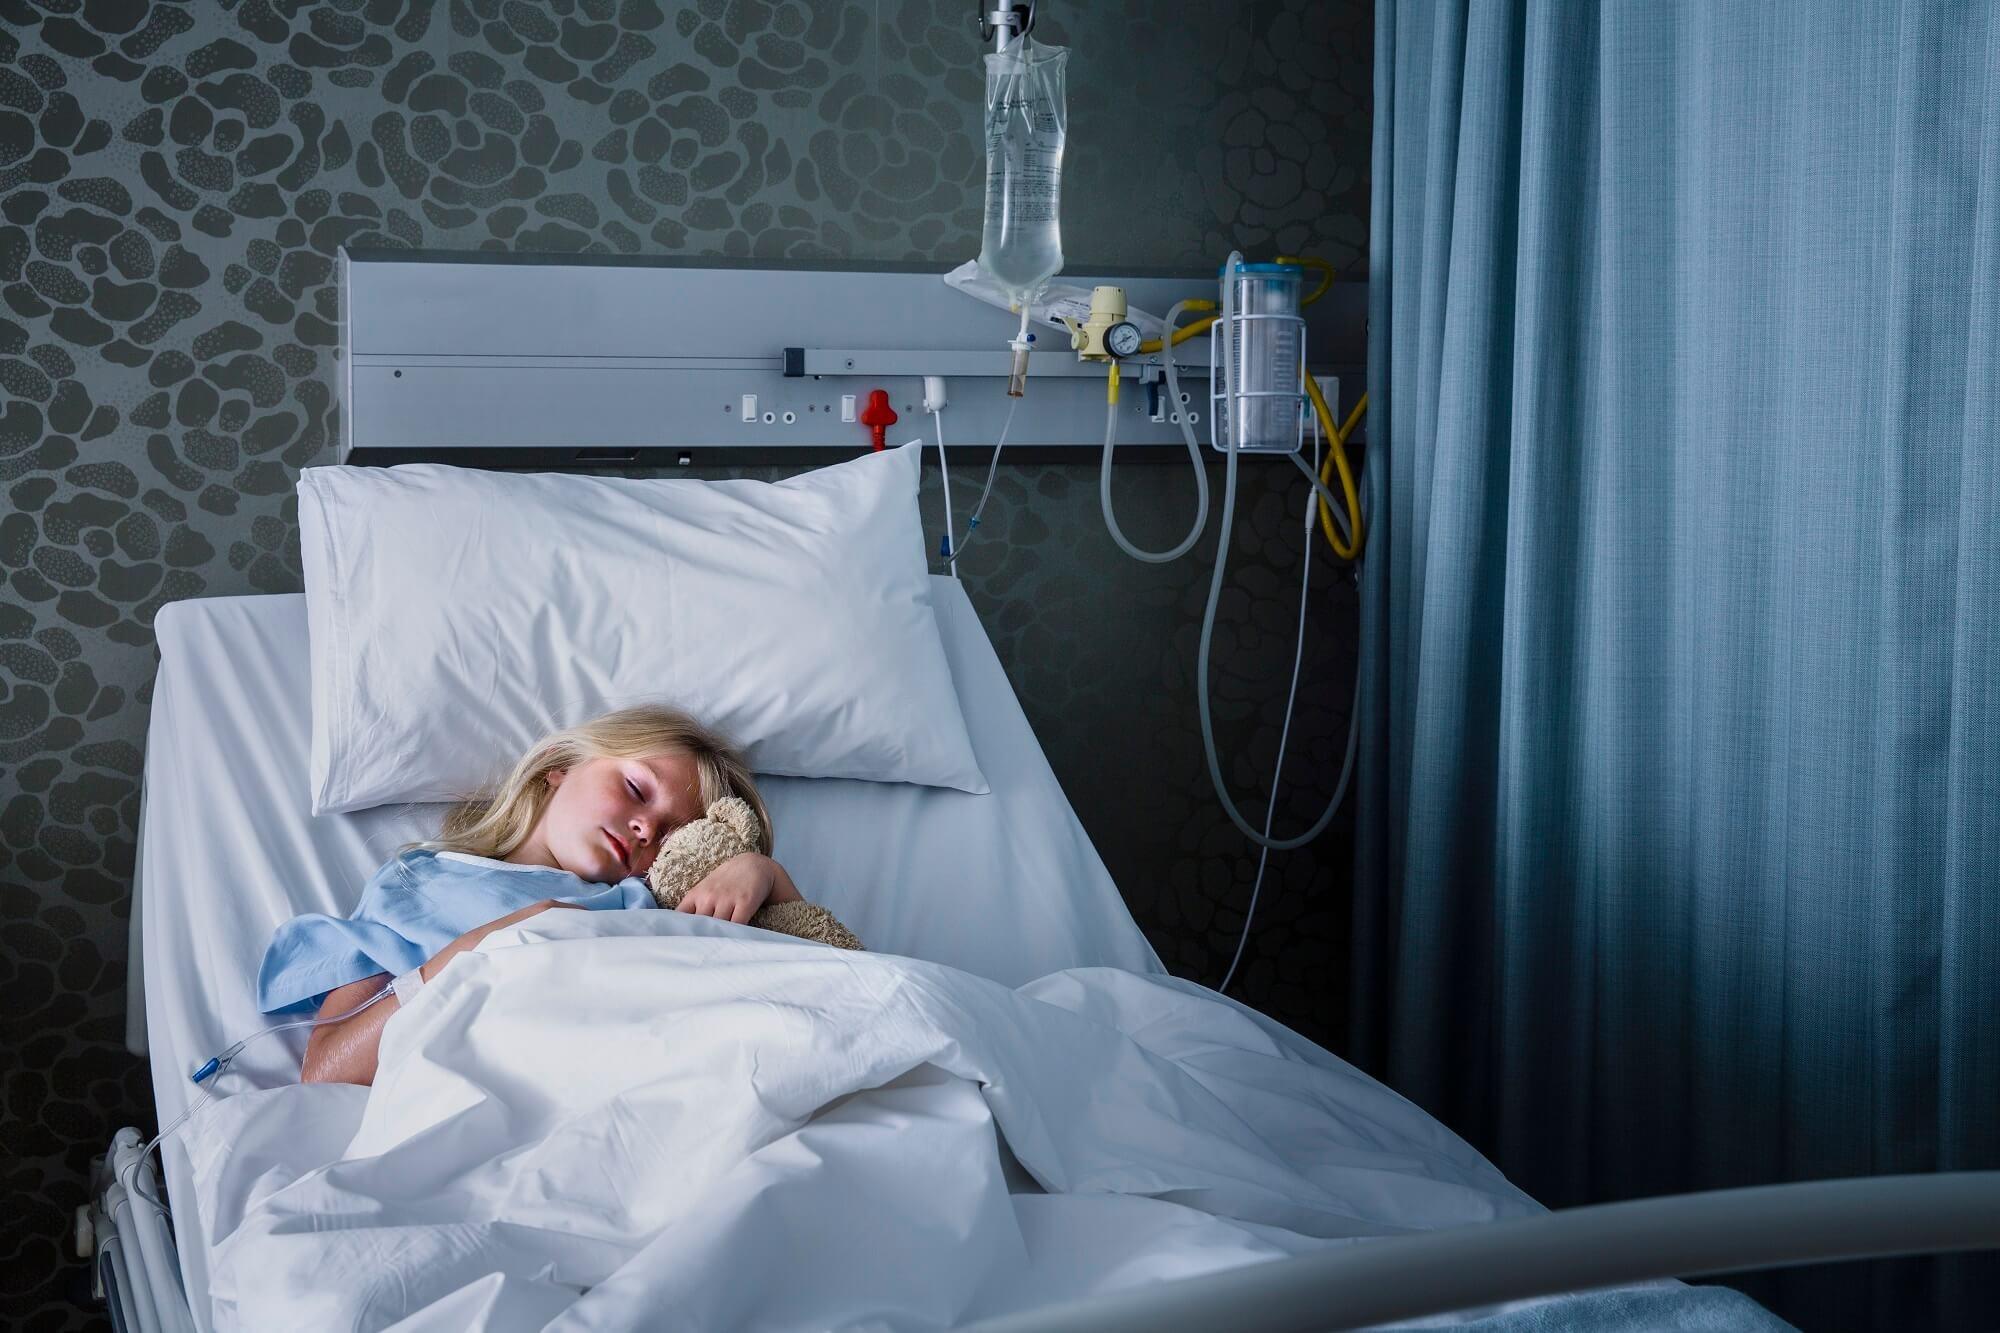 Inotuzumab Ozogamicin May Be Efficacious and Safe in Relapsed Pediatric Acute Lymphoblastic Leukemia